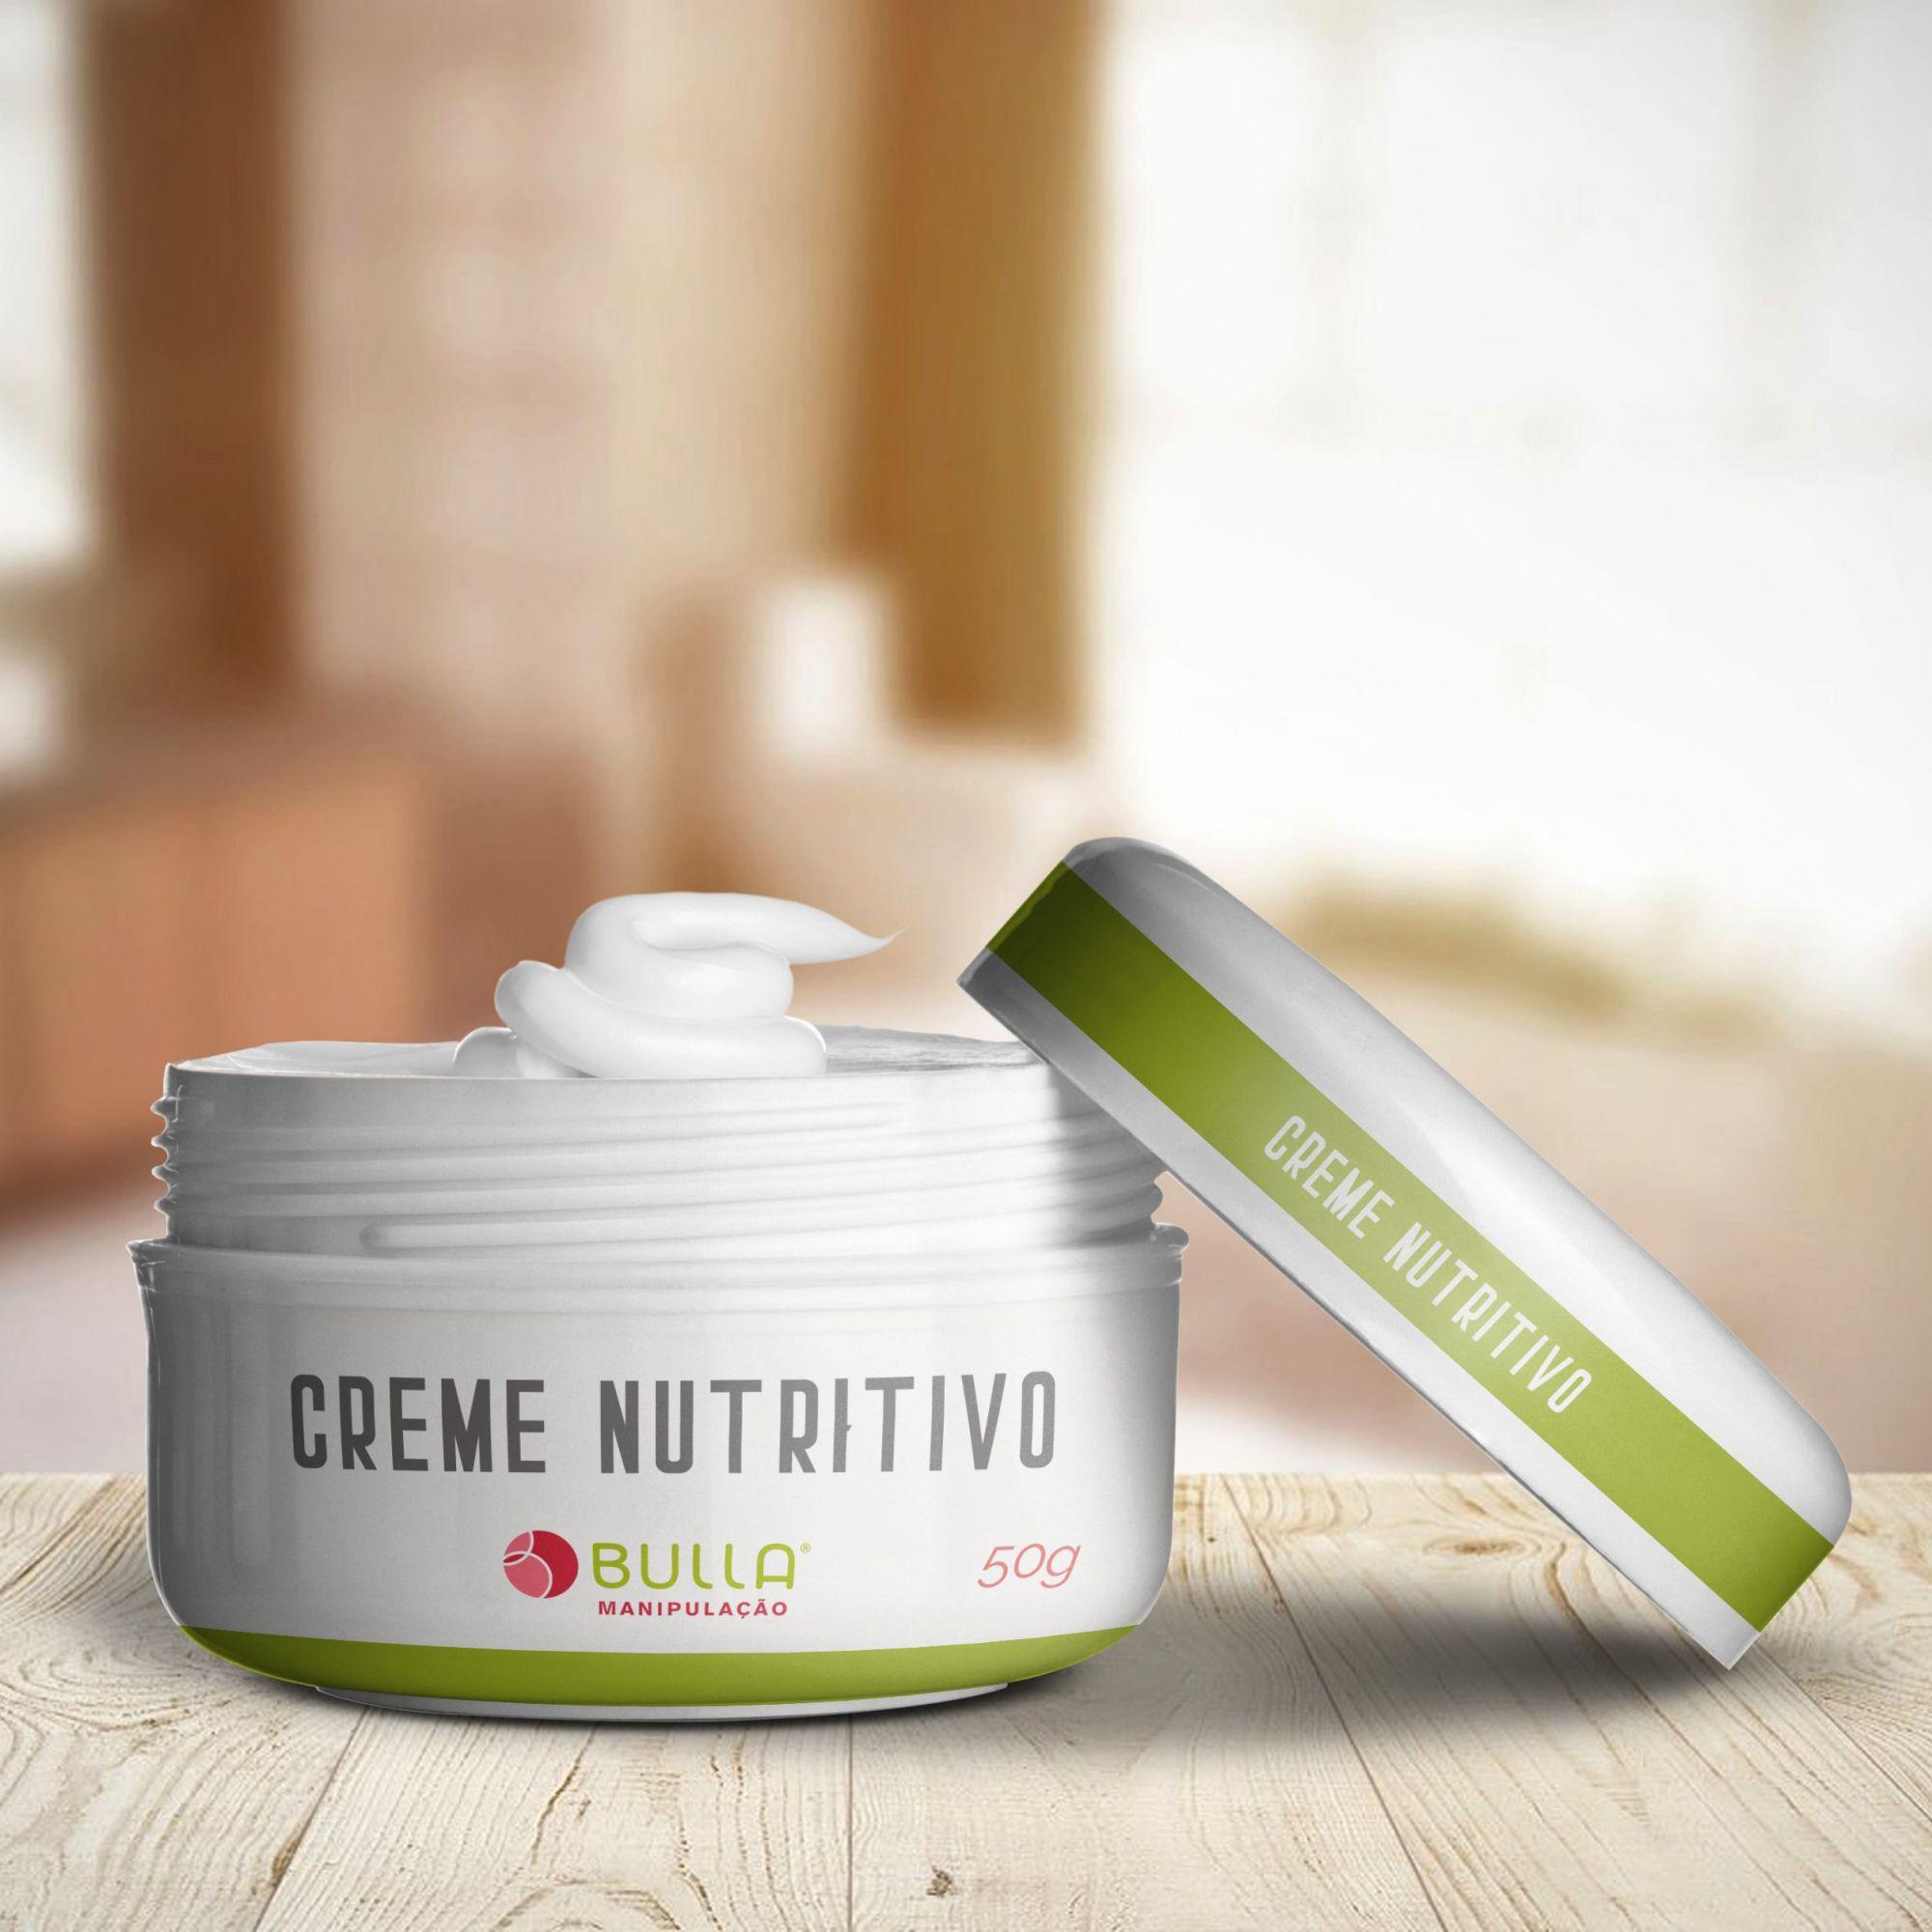 Creme Nutritivo - 50 g